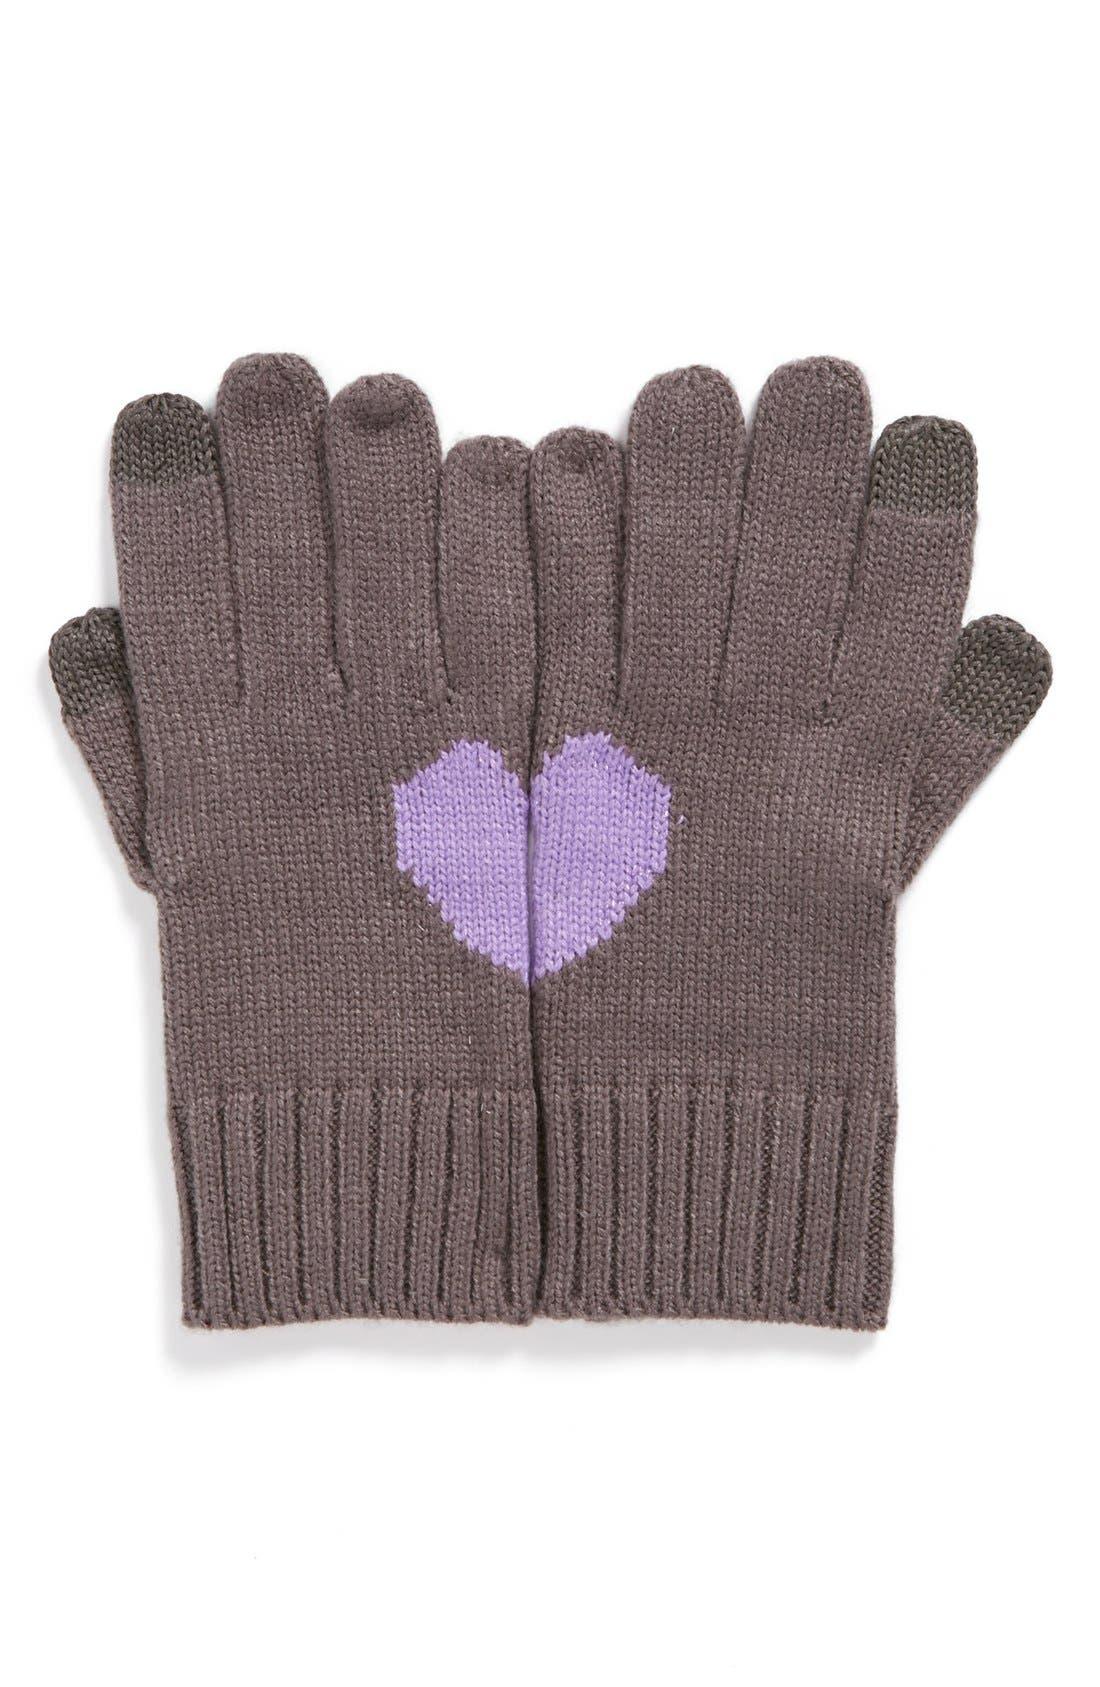 Alternate Image 1 Selected - BCBGeneration 'Love' Gloves